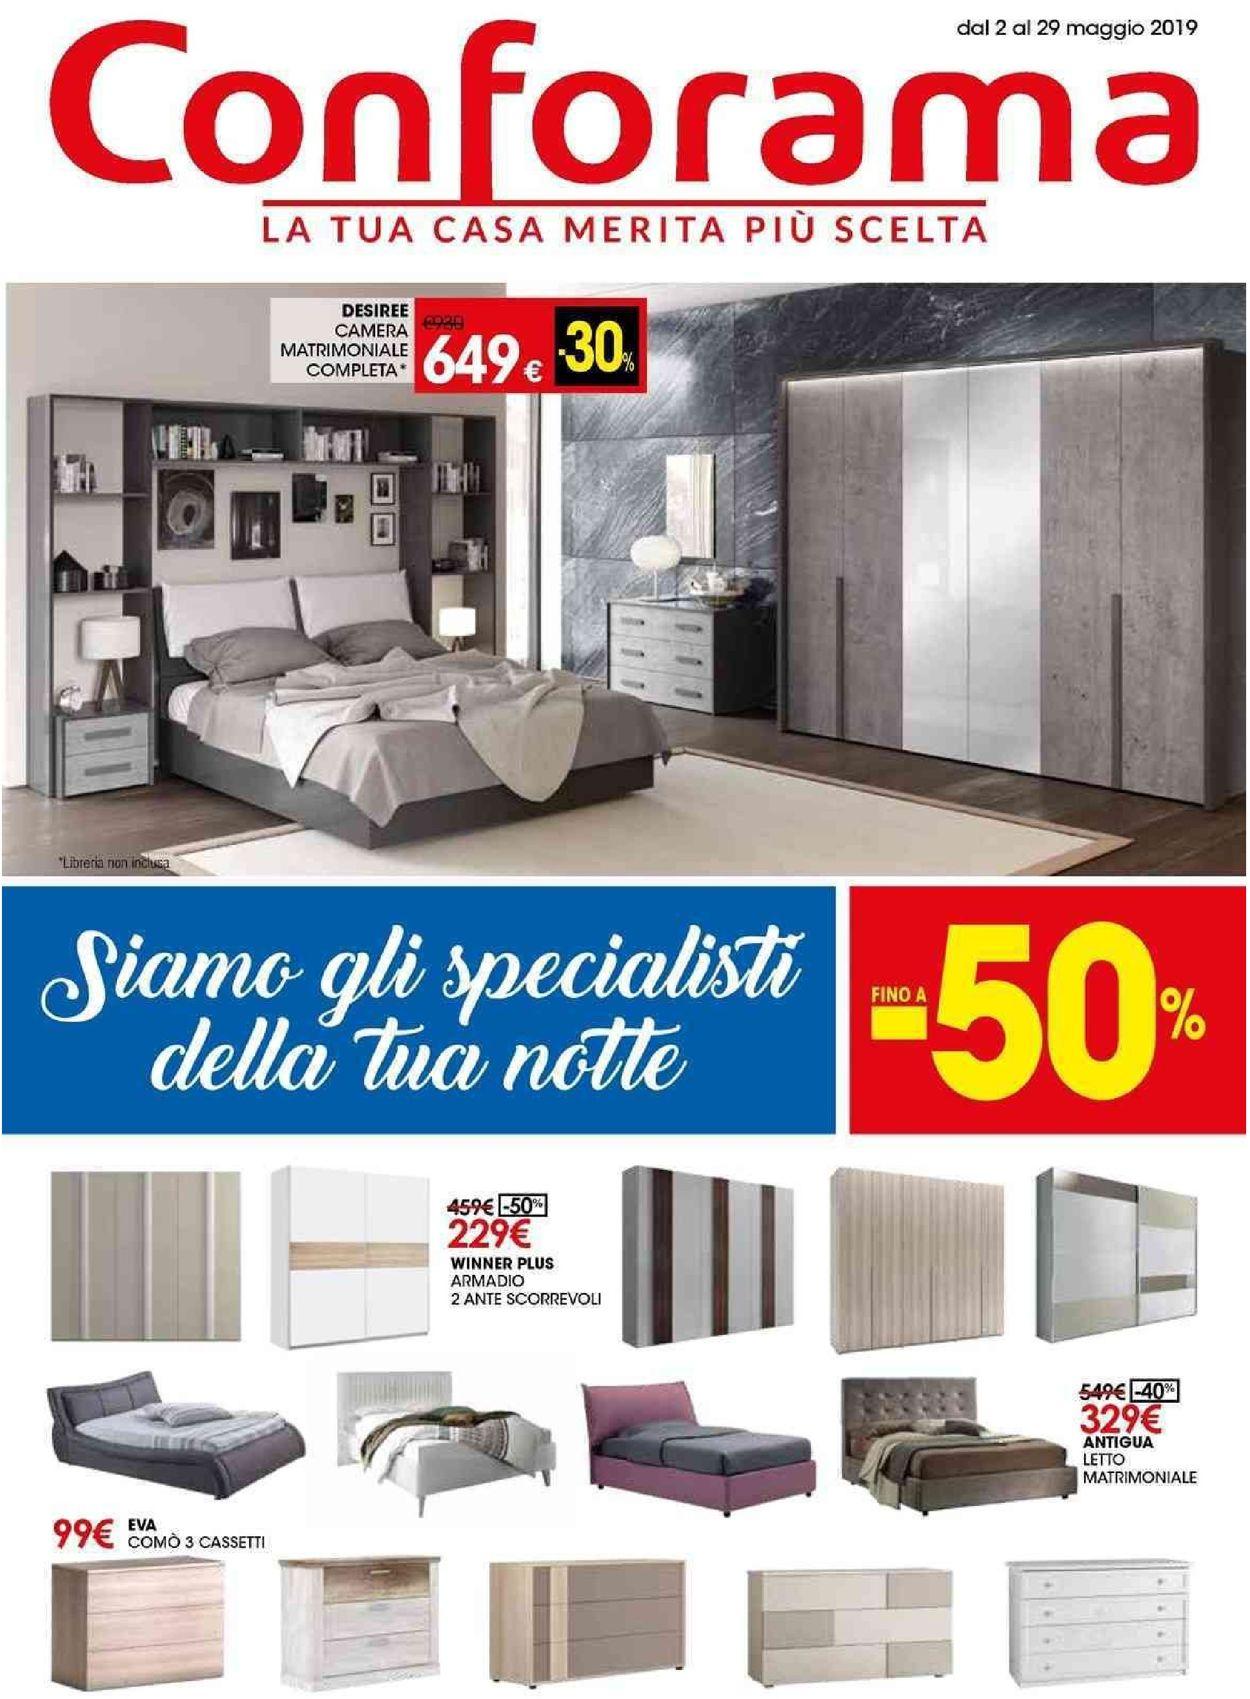 Volantino Conforama - Offerte 02/05-29/05/2019